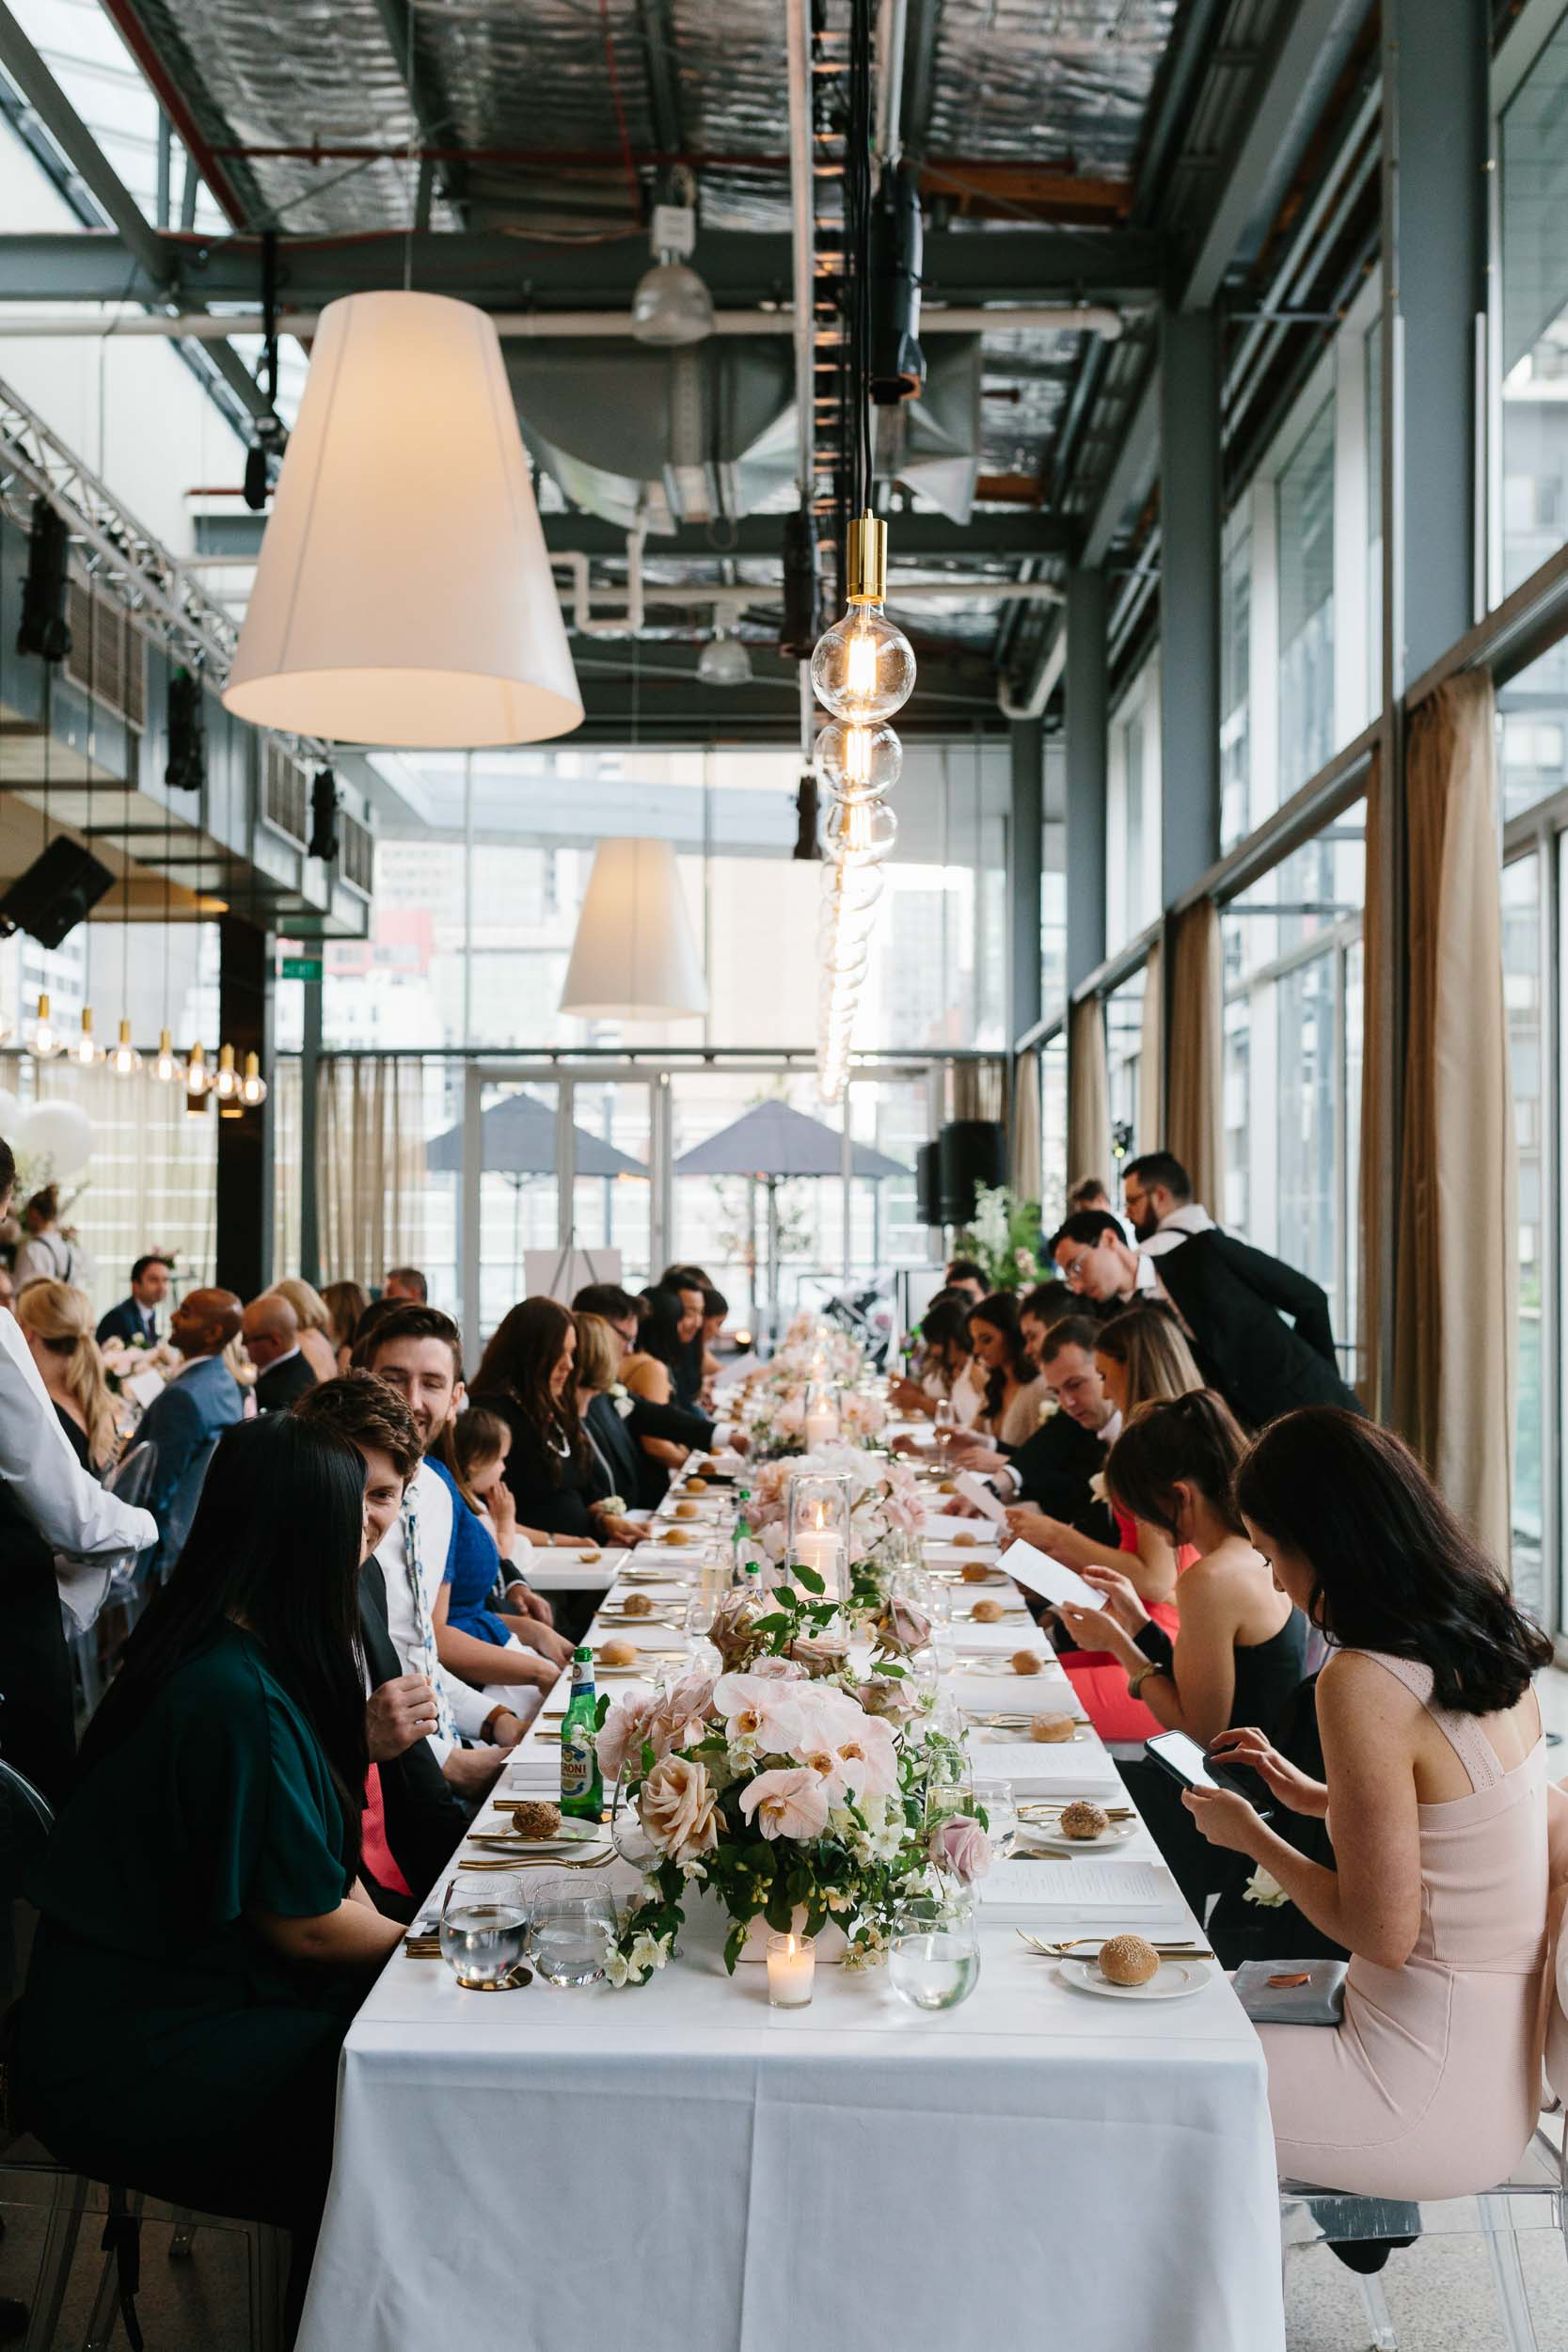 Kas-Richards-Wedding-Photographer-Melbourne-City-Wedding-Alto-Event-Space-Jane-Hill-Bridal-Gown-58.jpg